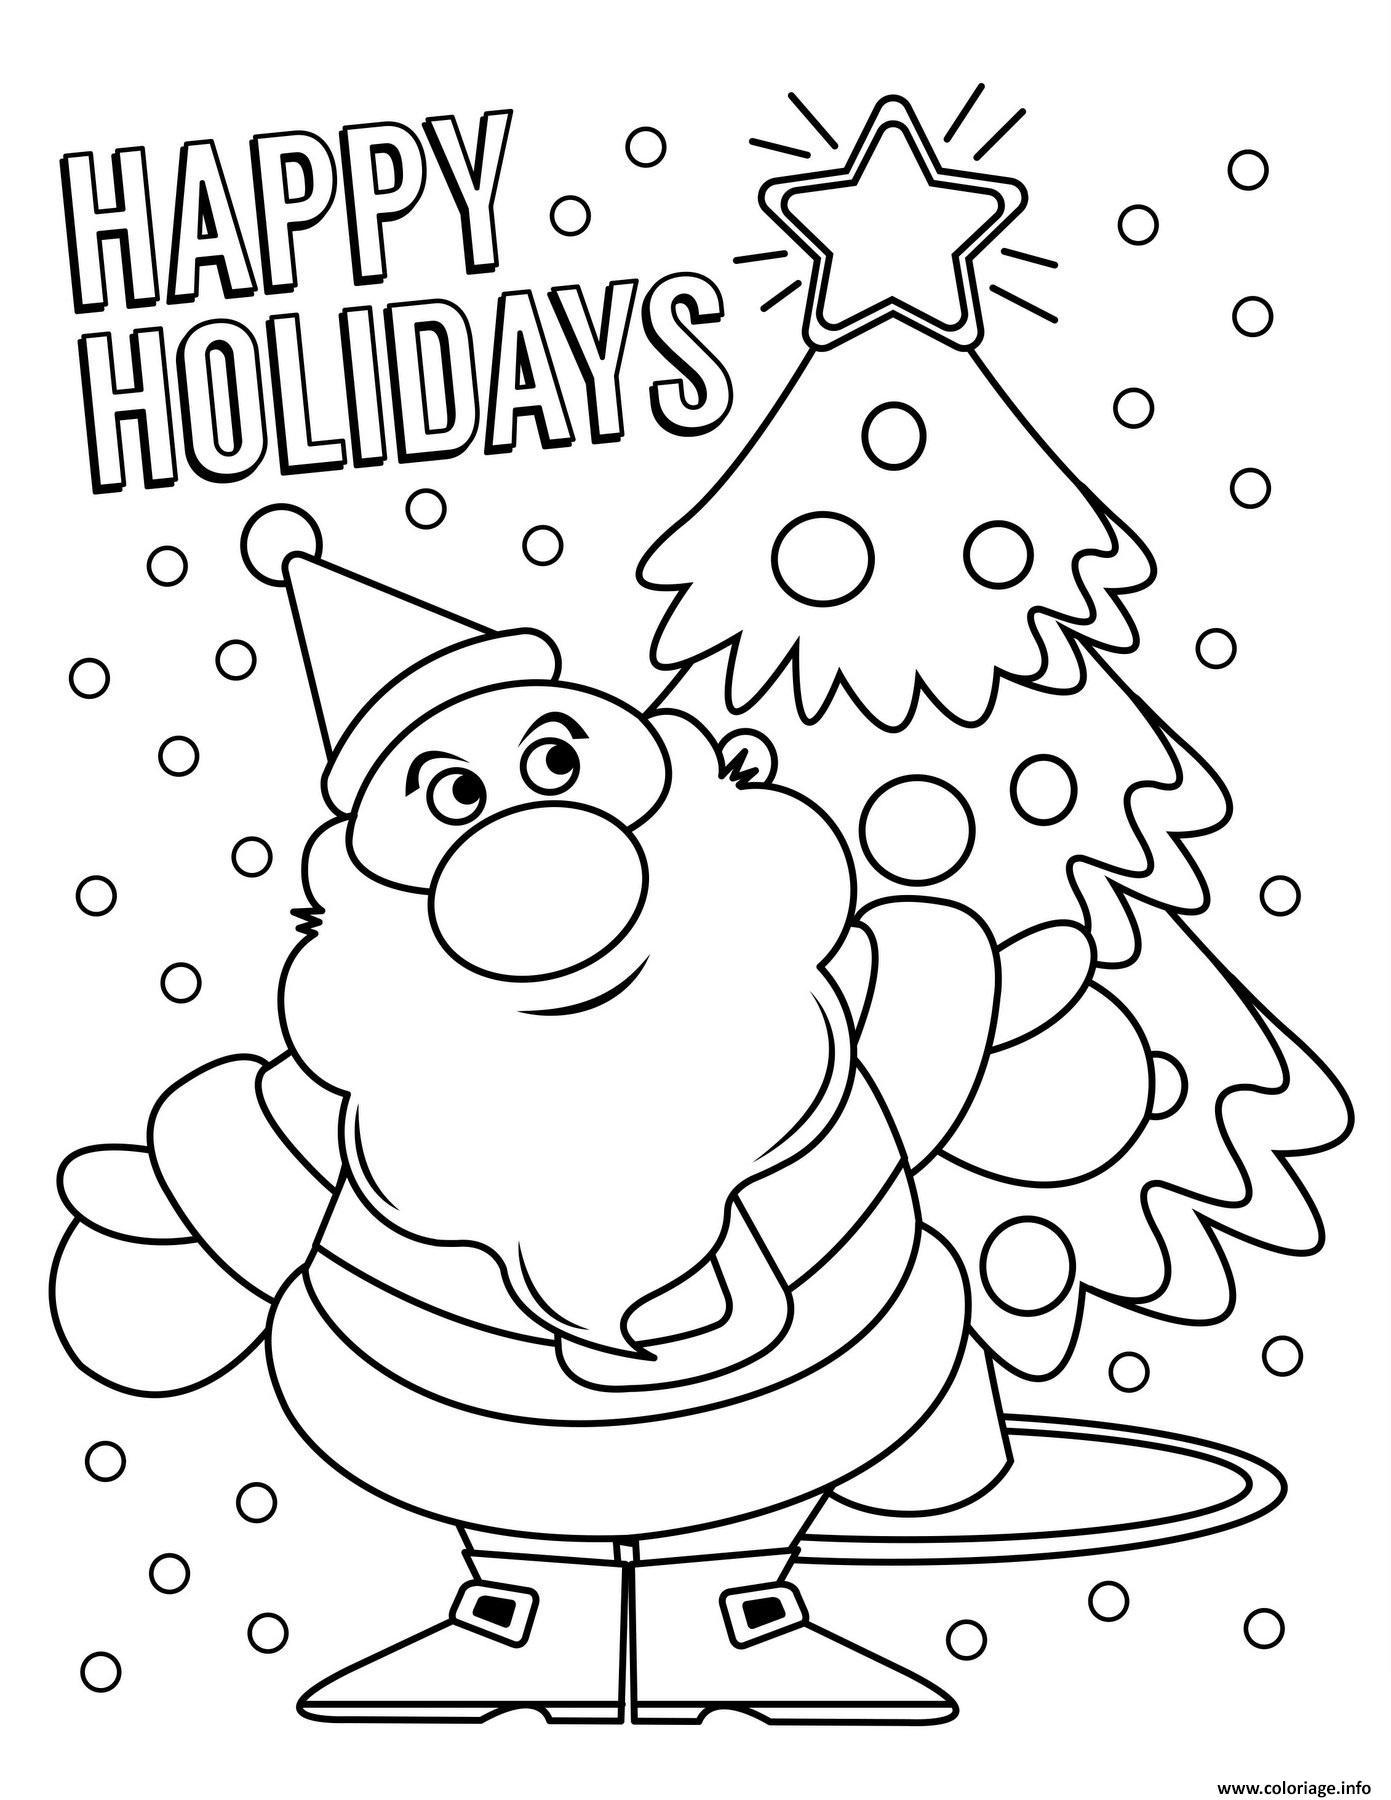 Coloriage Joyeux Temps Des Fetes Par El Pere Noel Dessin